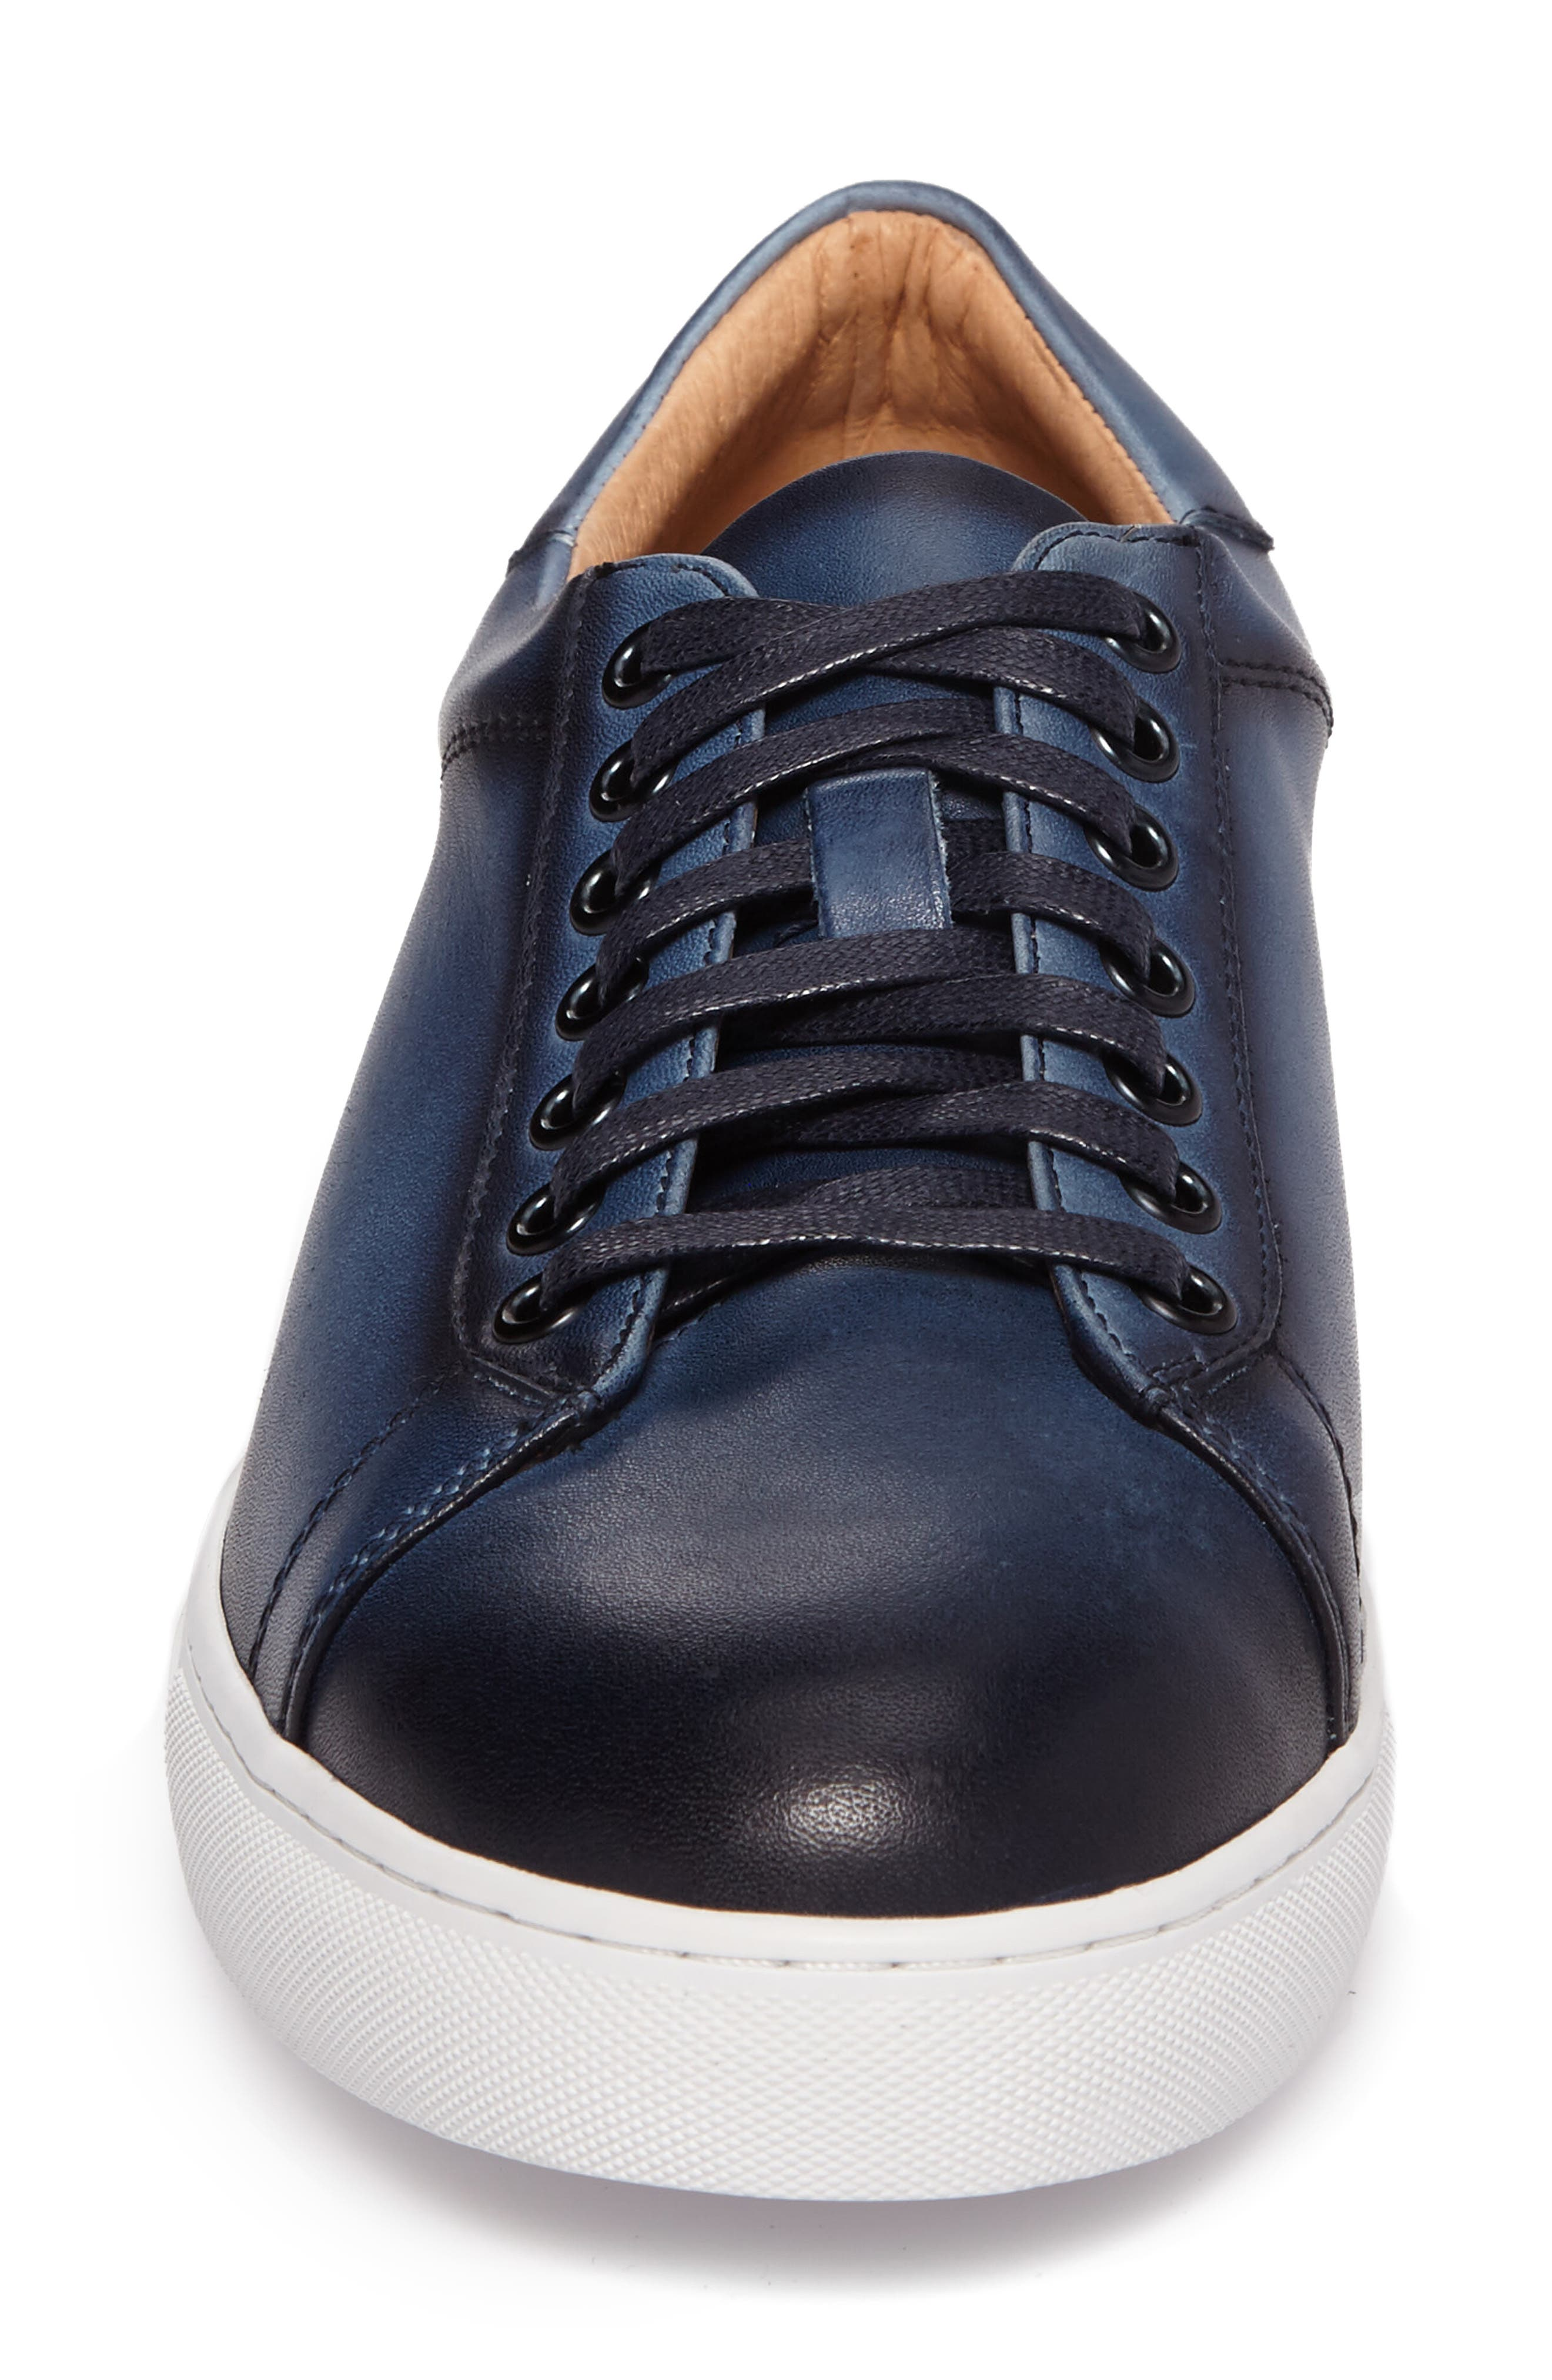 Penrose Sneaker,                             Alternate thumbnail 4, color,                             Blue Leather